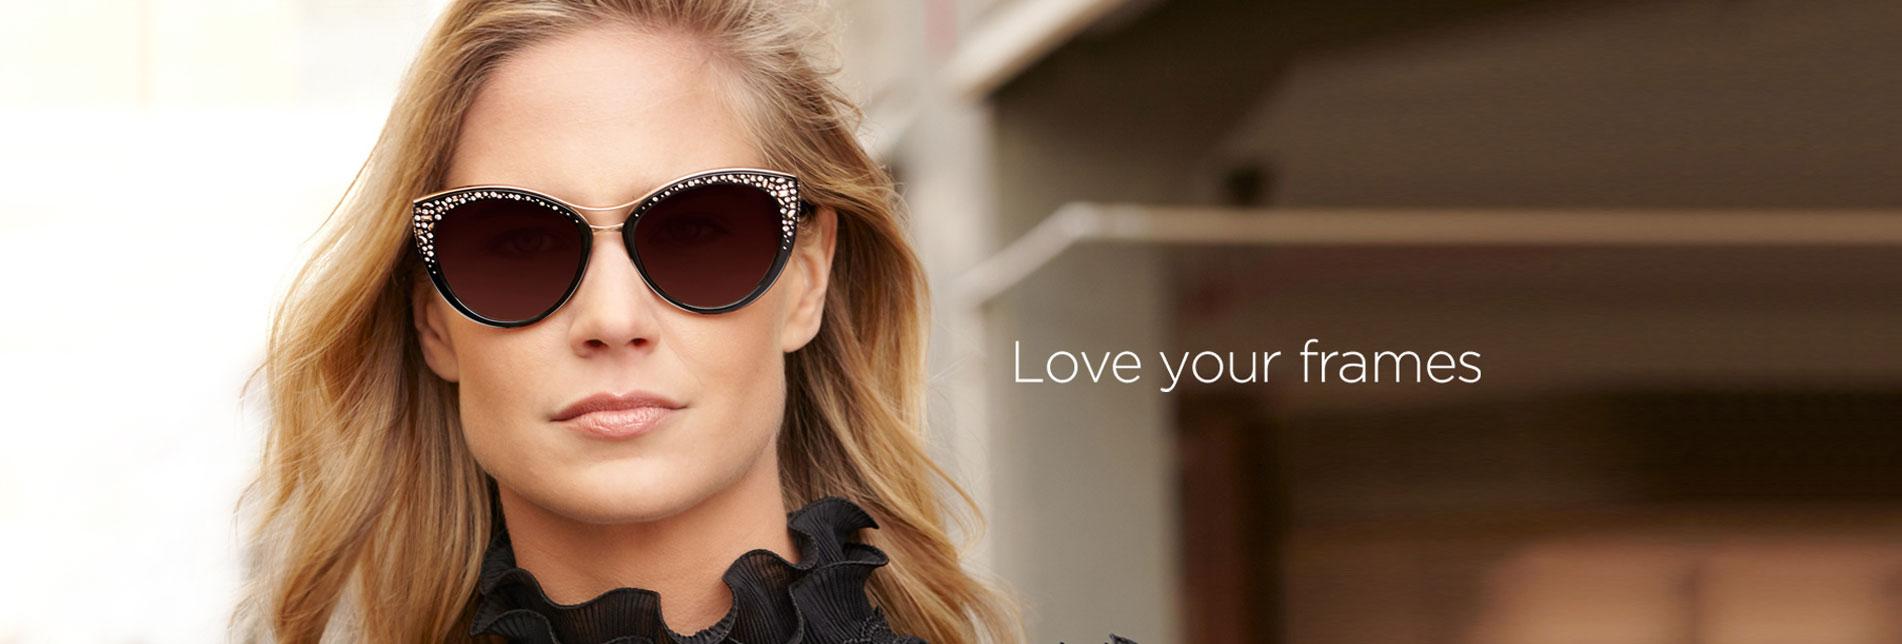 love-your-frames-banner